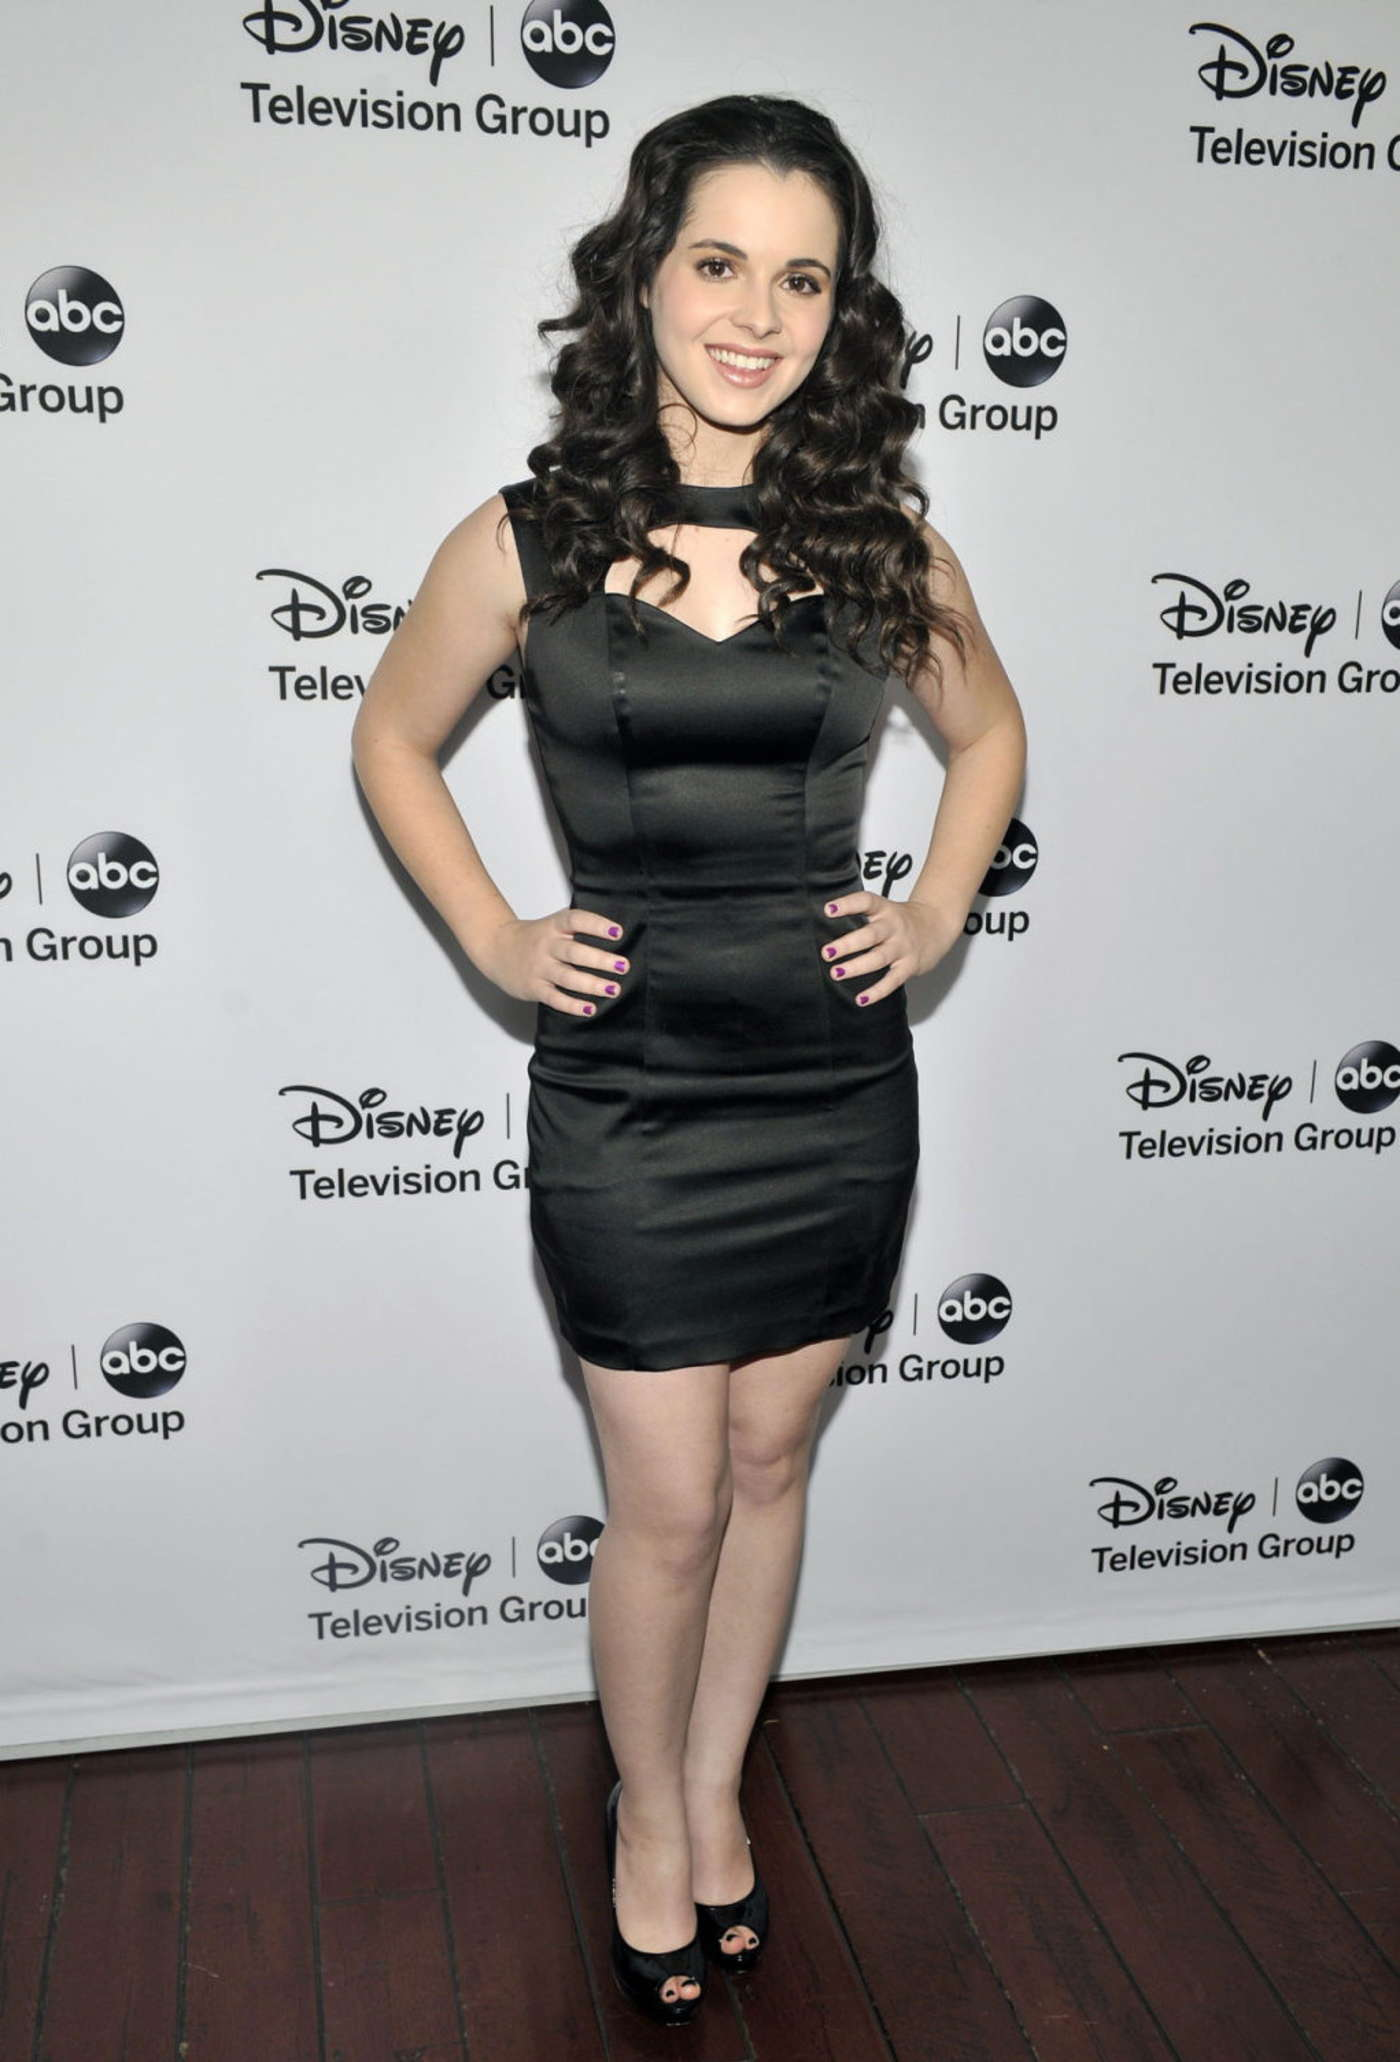 Vanessa Marano TCA Winter Press Tour Disney Gala 2013 -02 ...